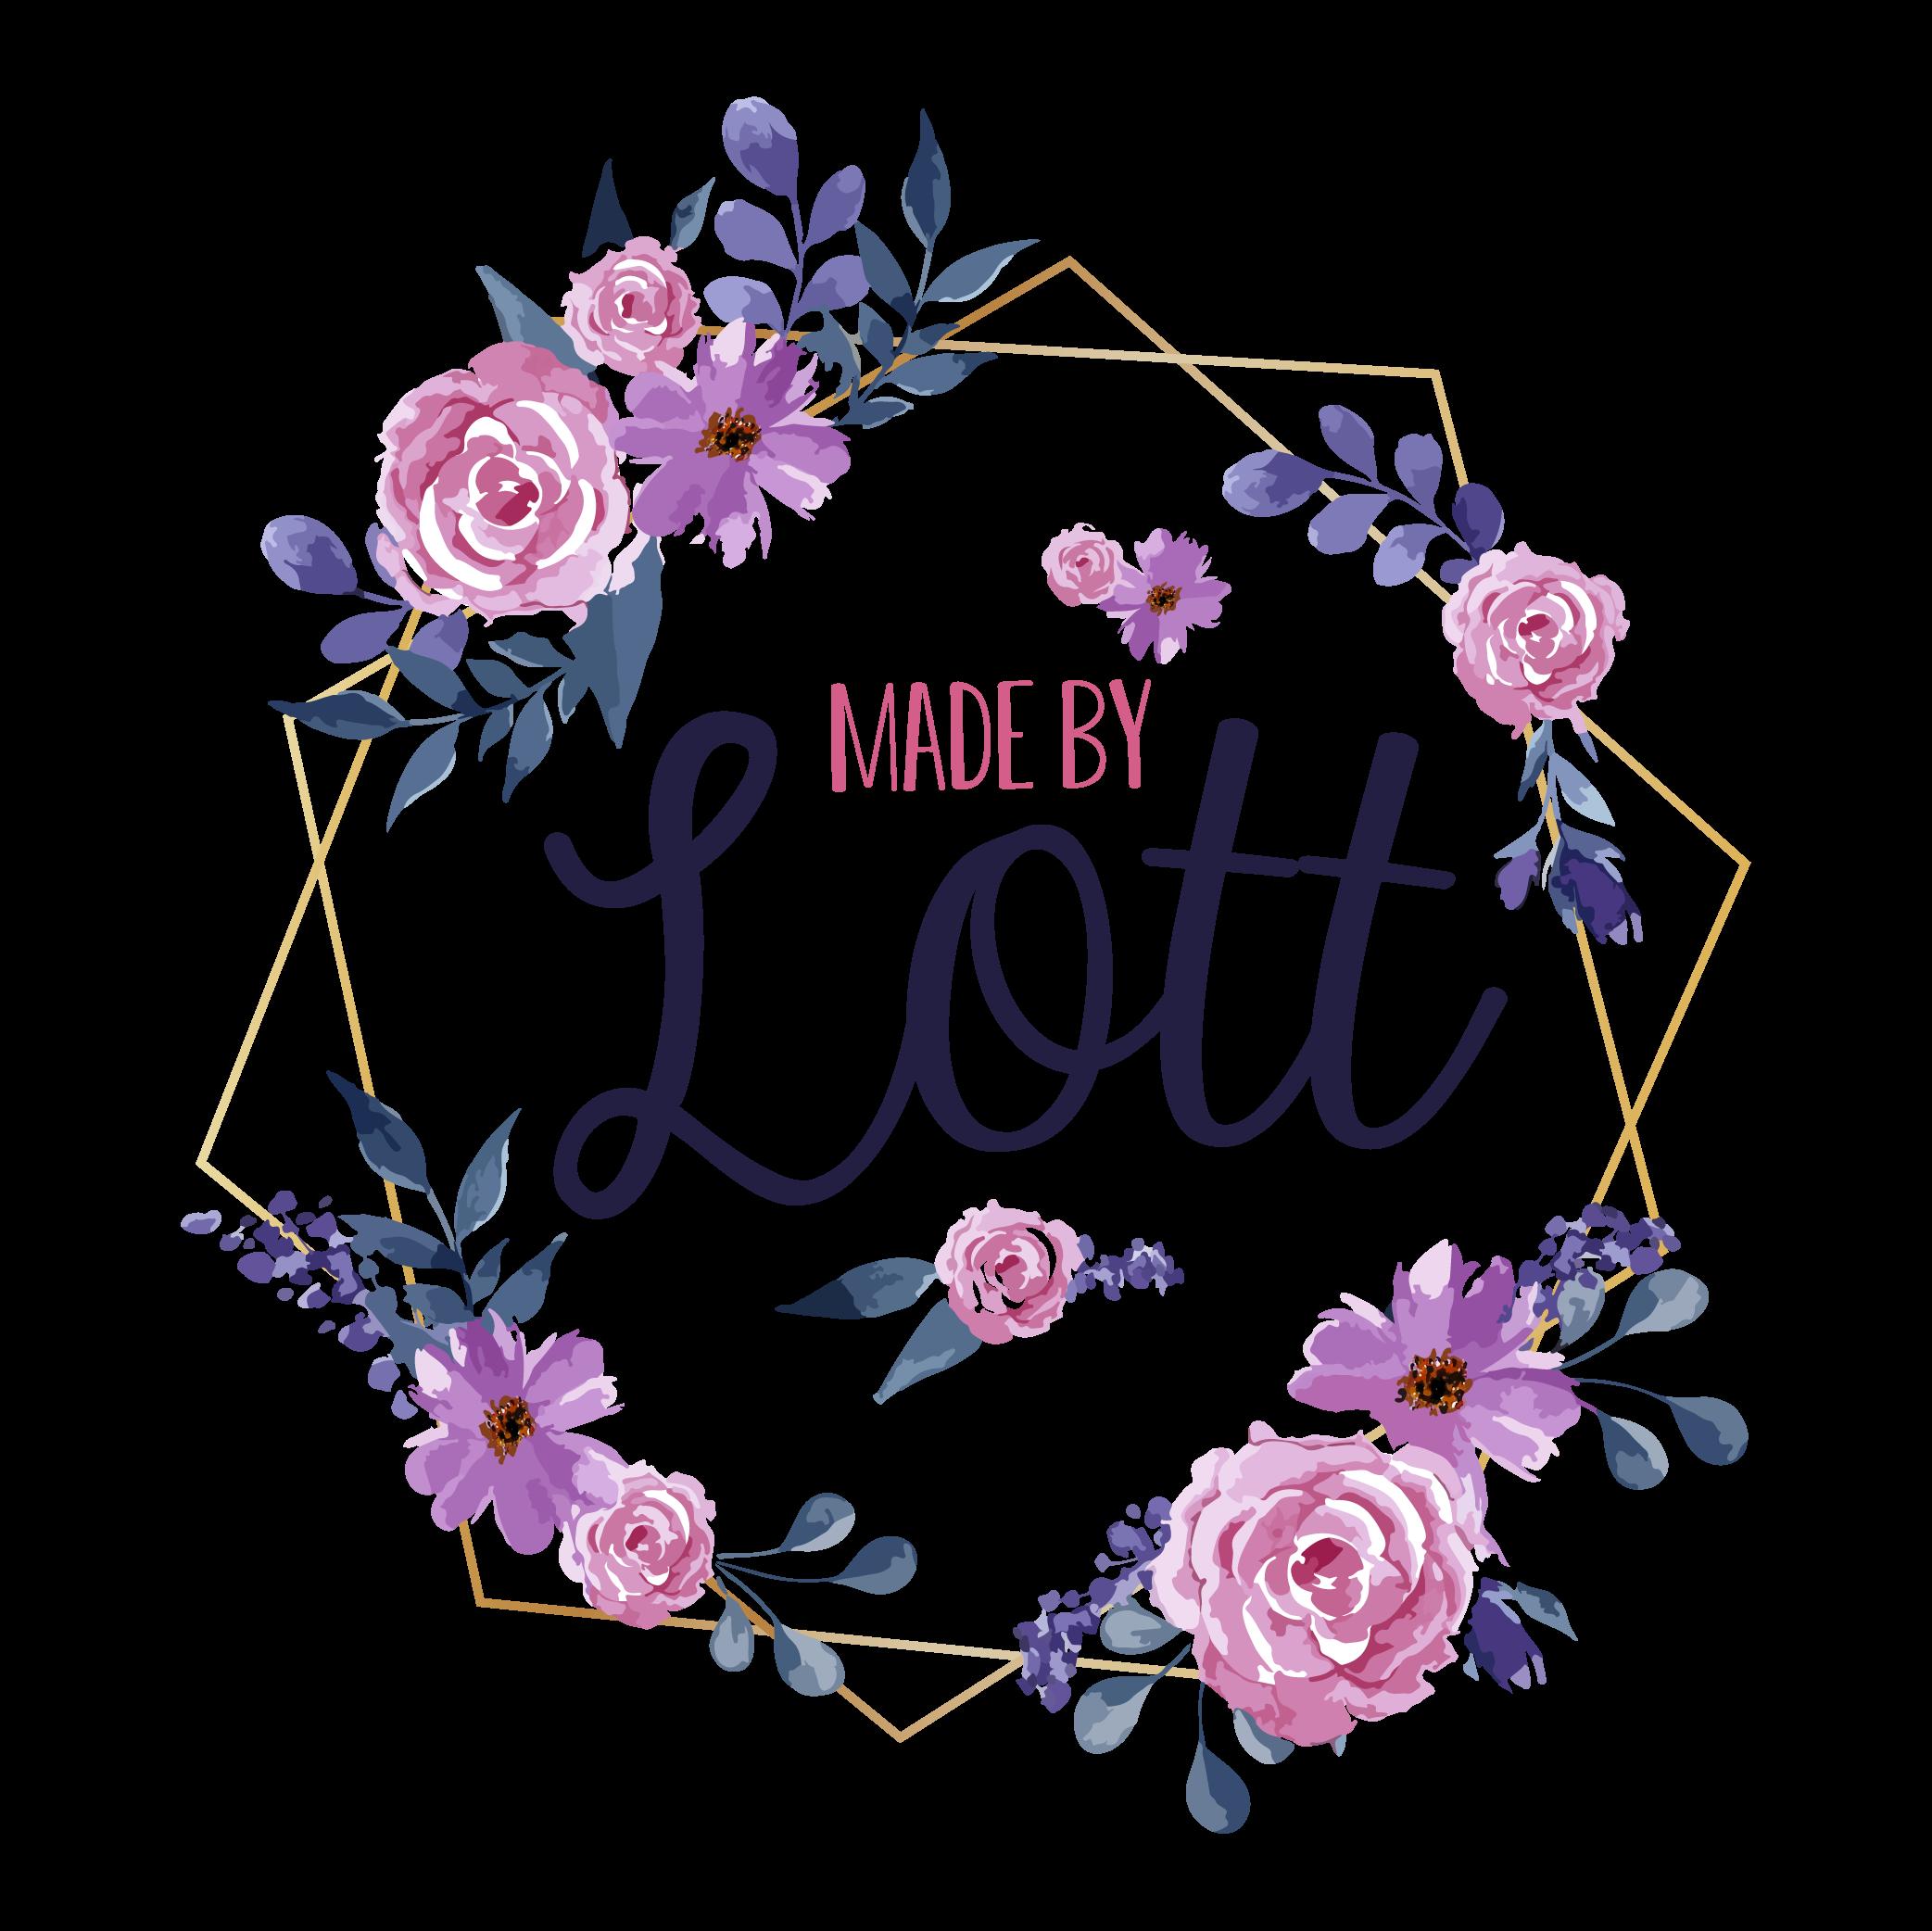 Made by LOTT